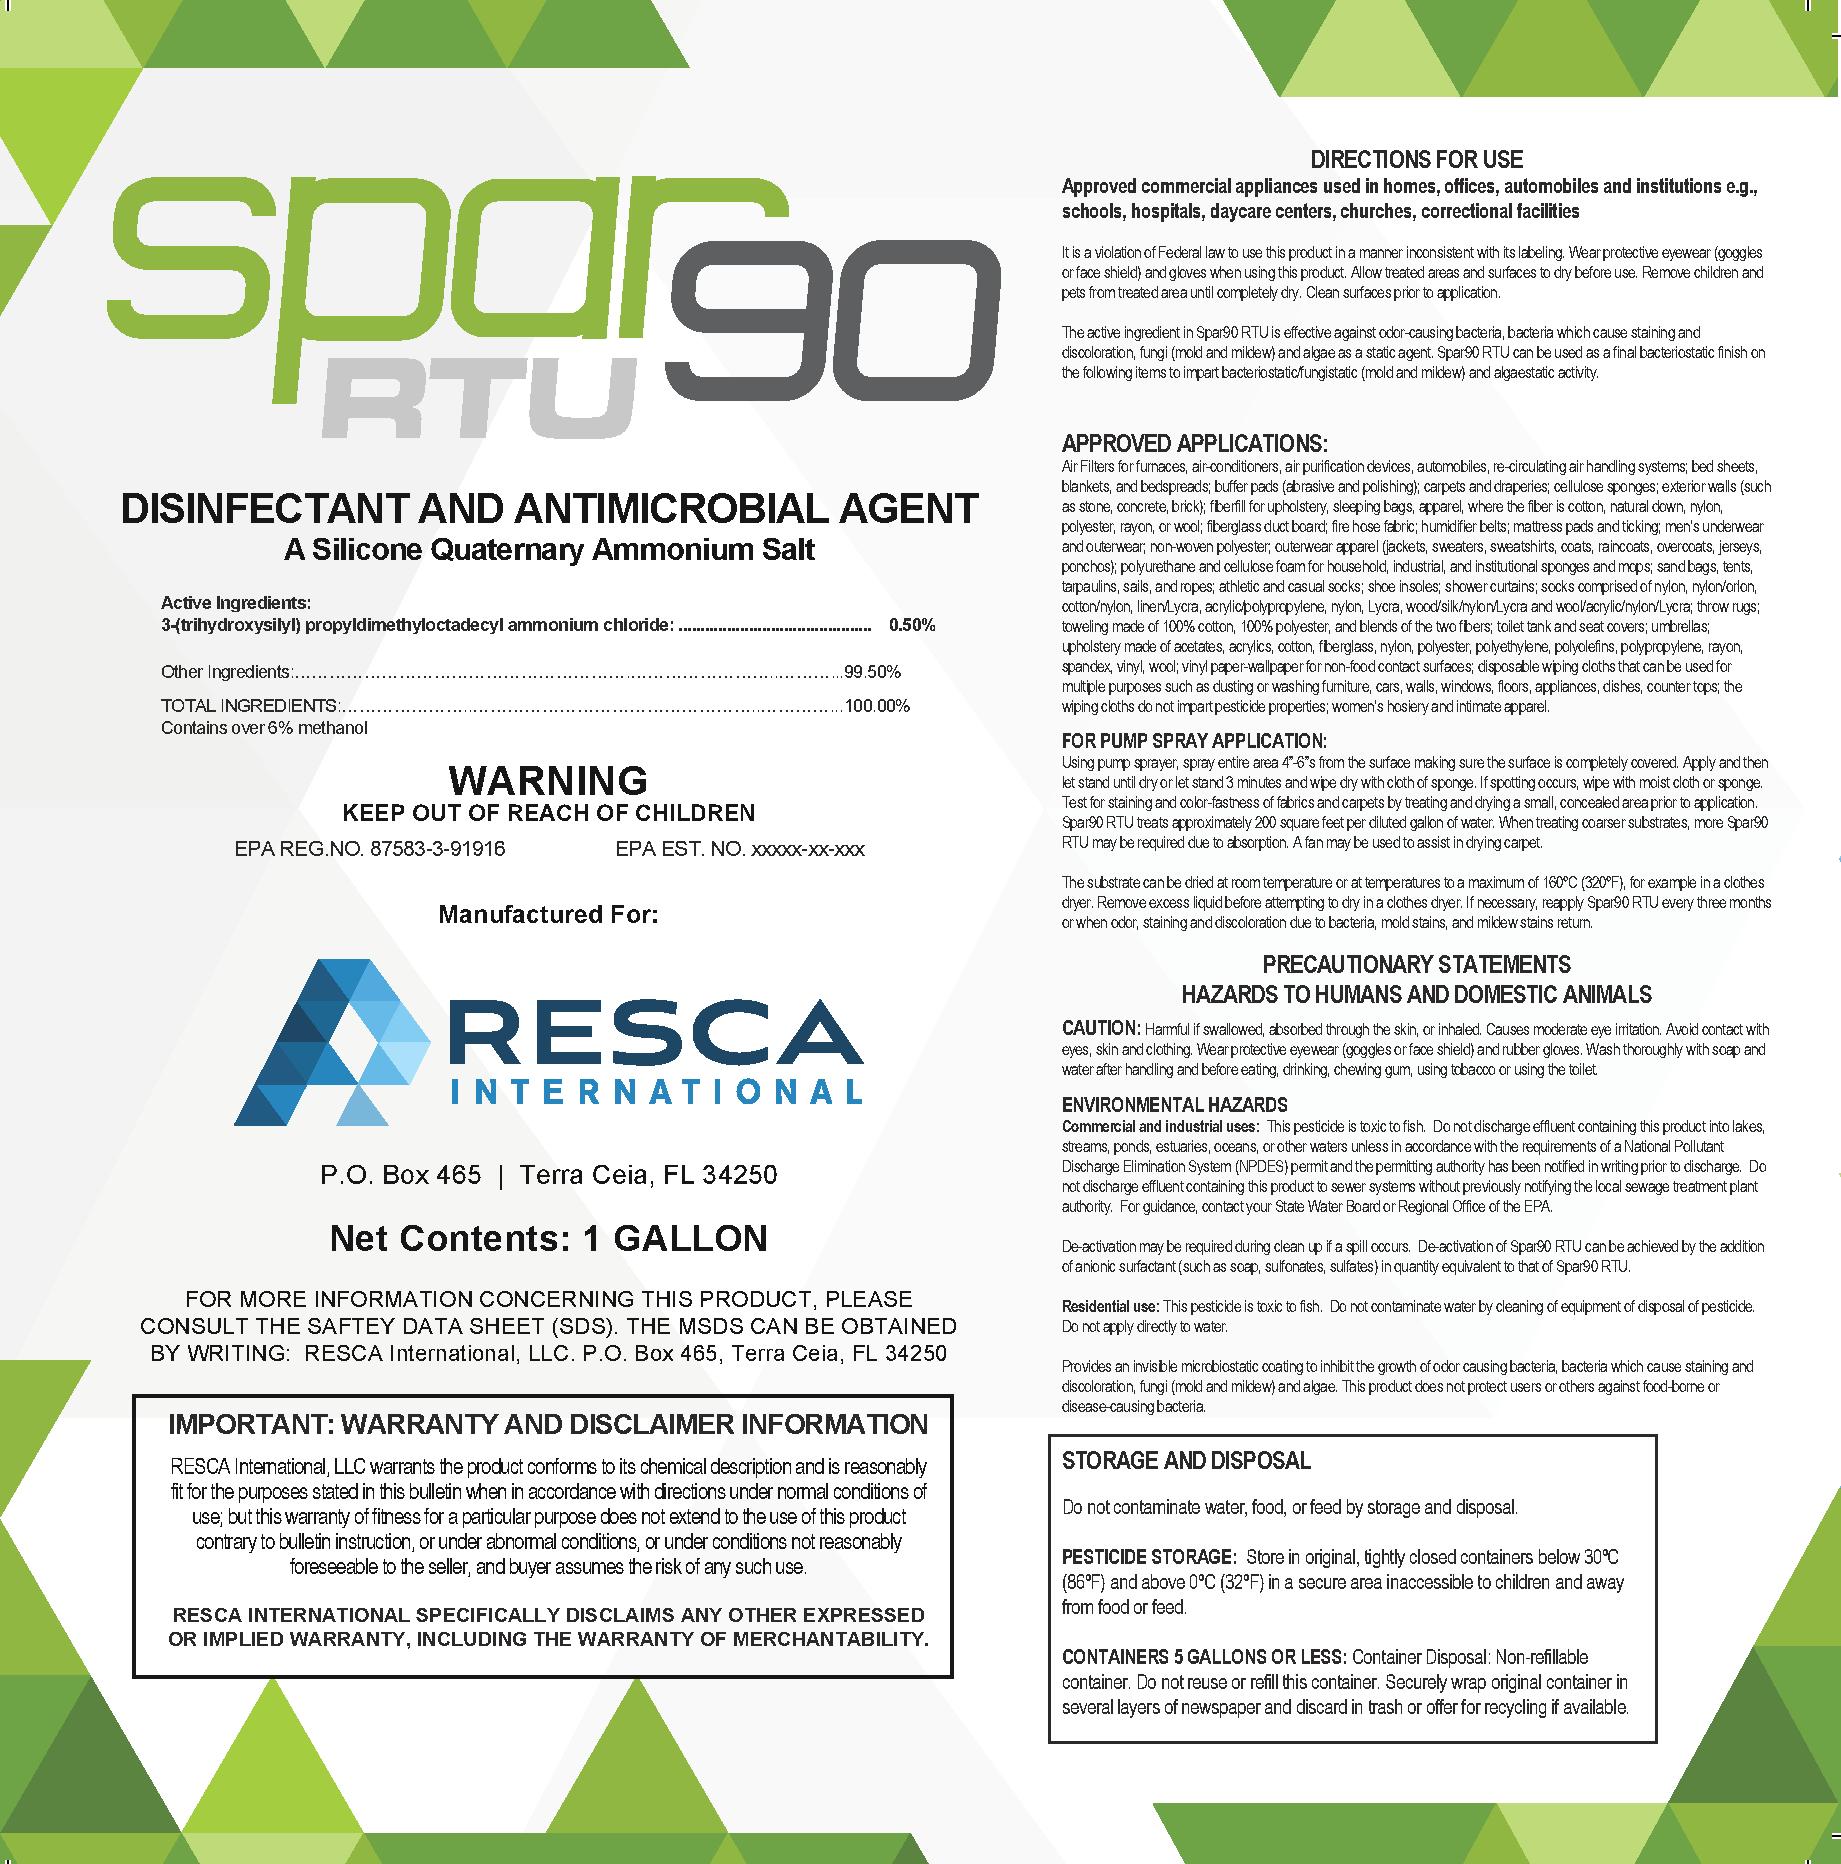 Spar90 Ready-to-Use